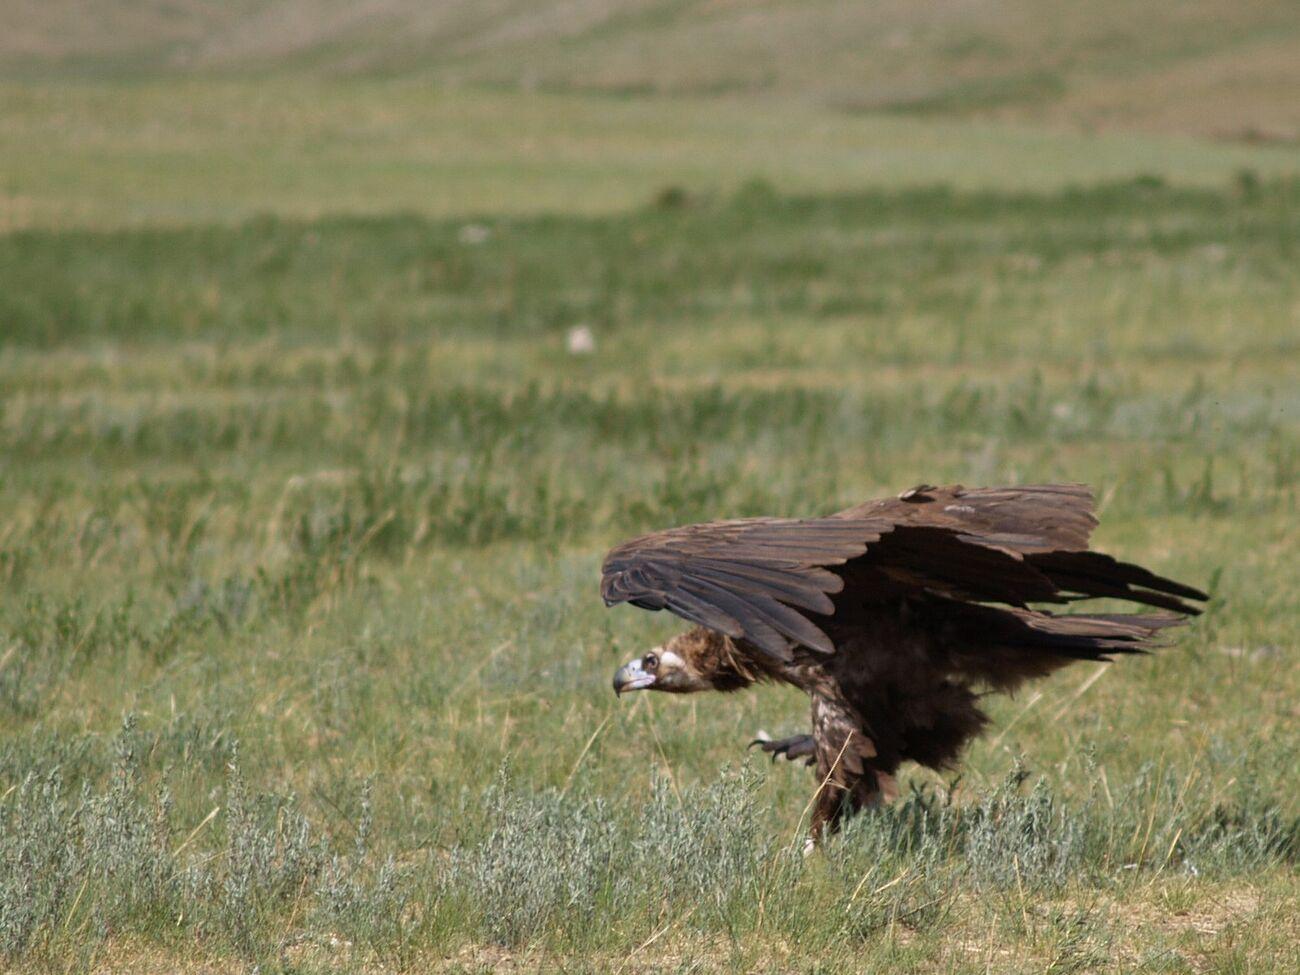 [Image: 56235090-black-vulture.jpg]